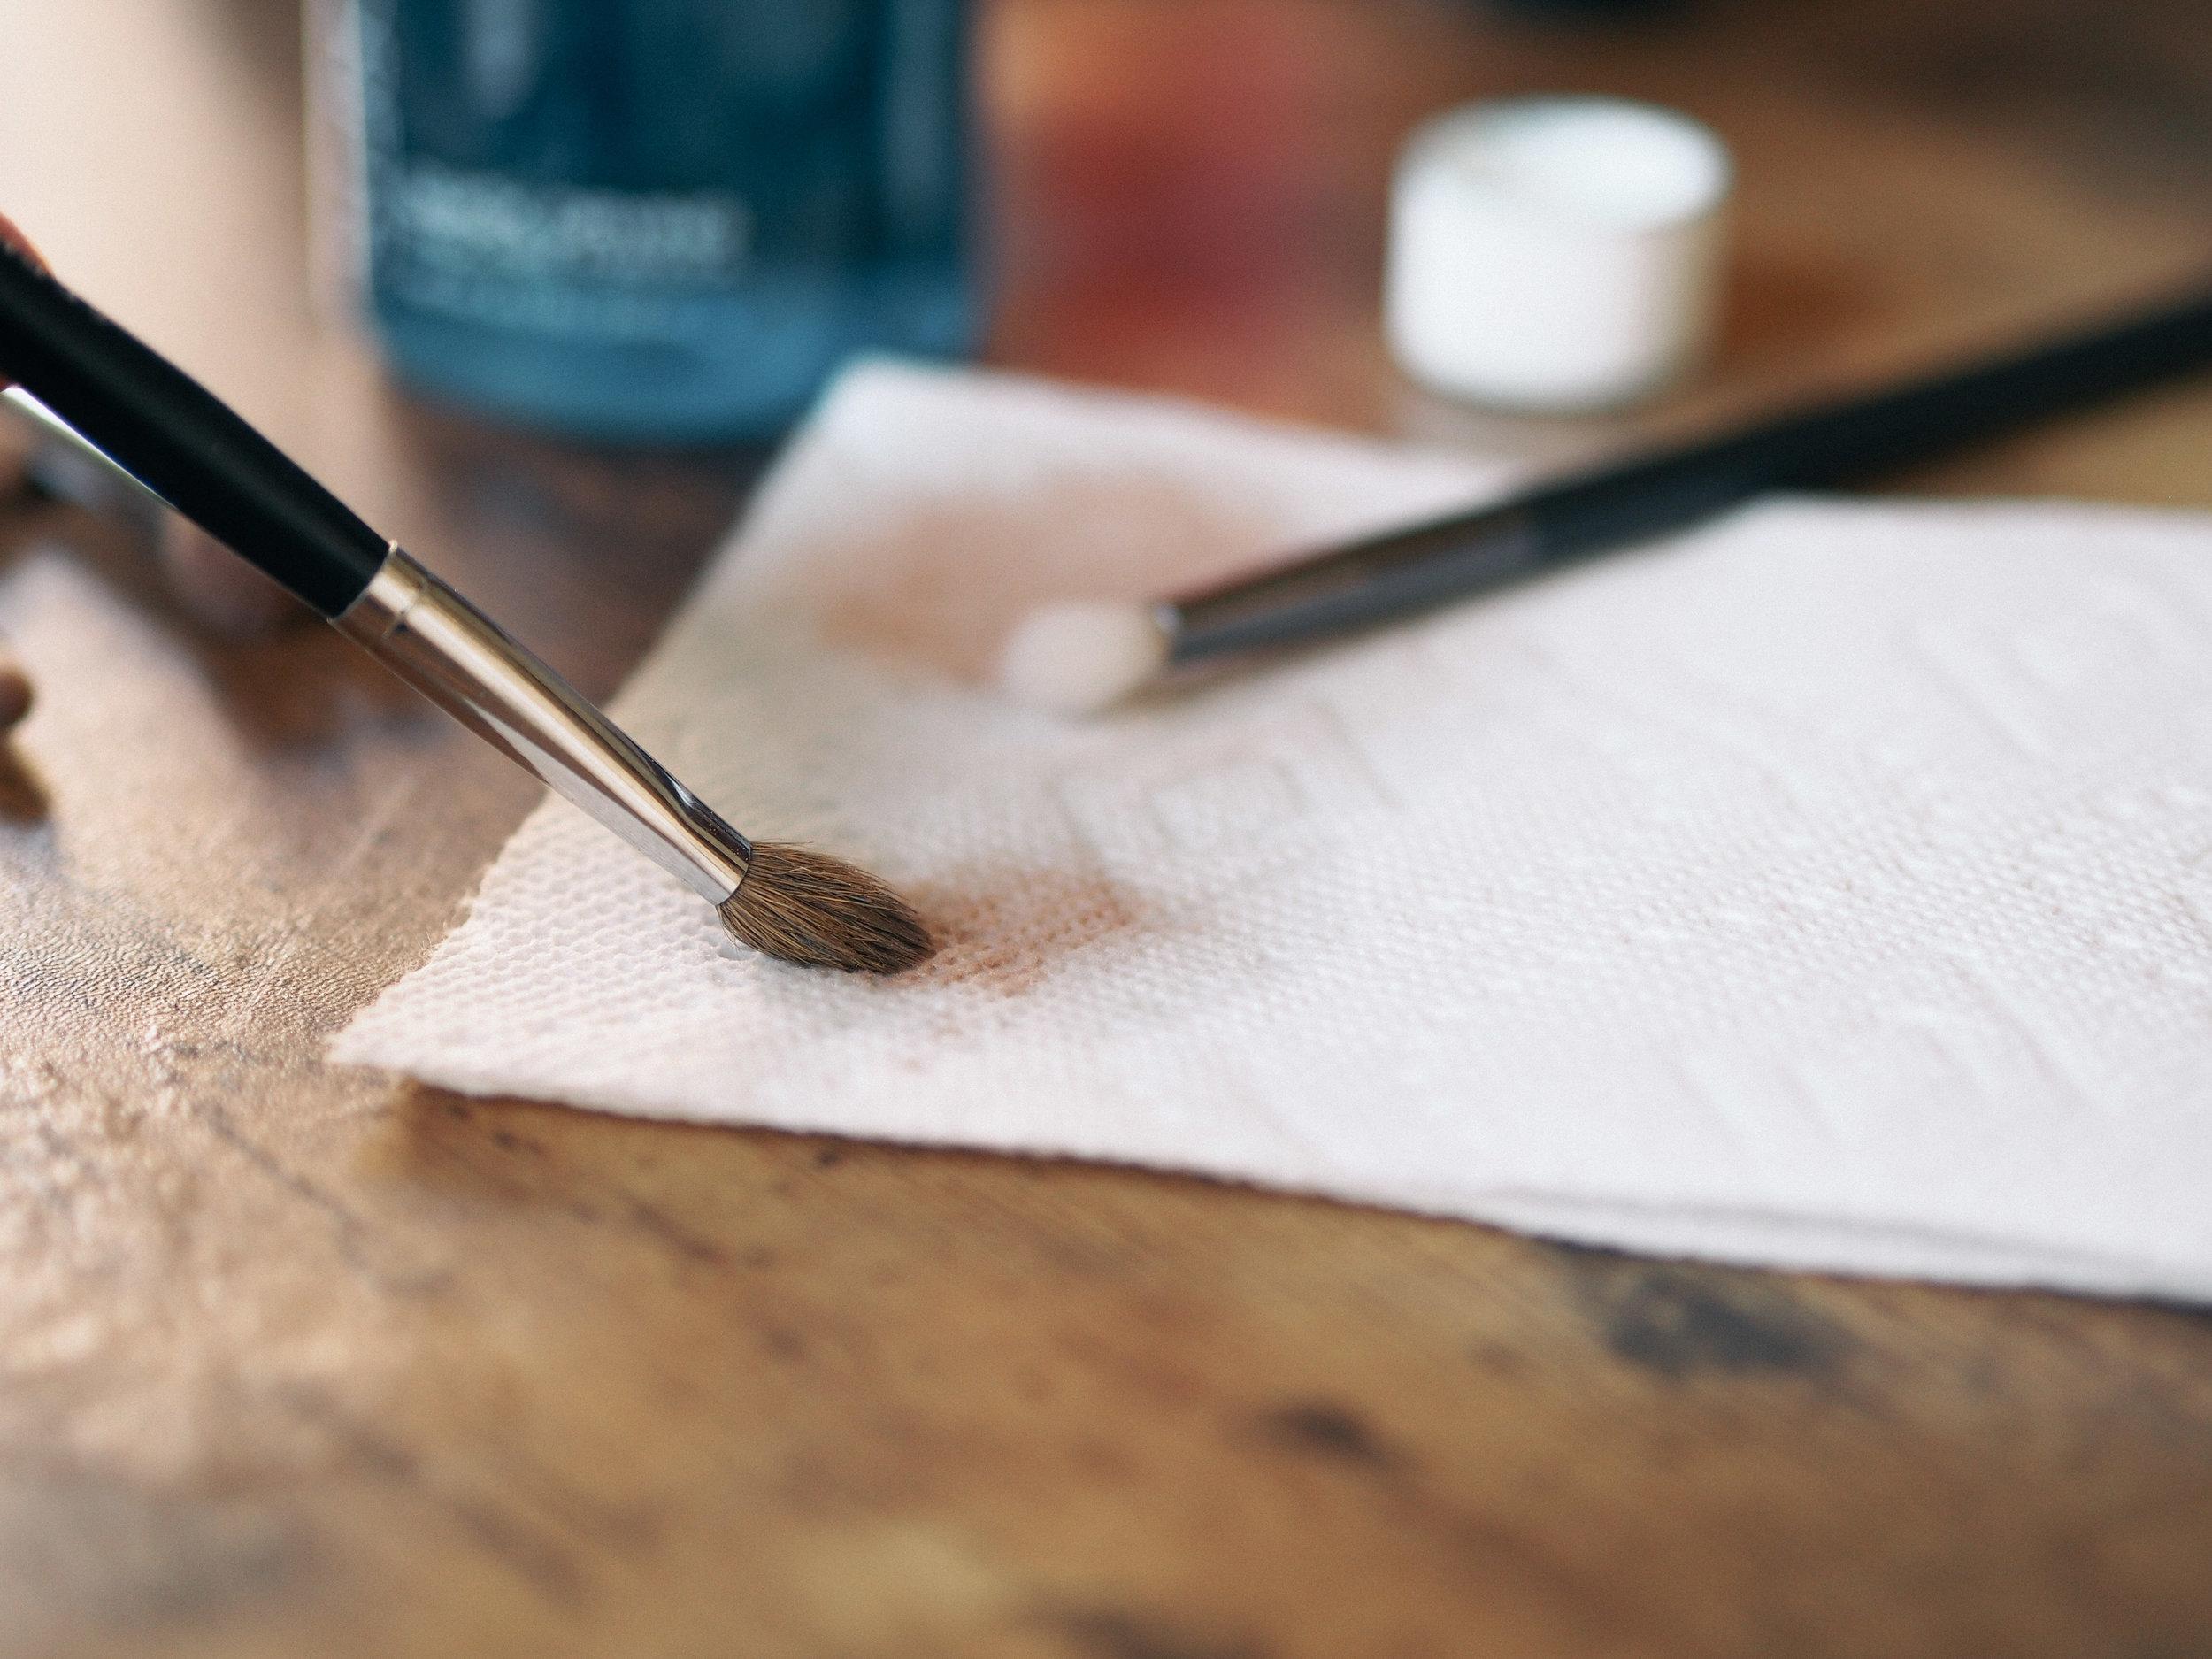 cinema-secrets-makeup-brush-cleaner-review-6.jpg